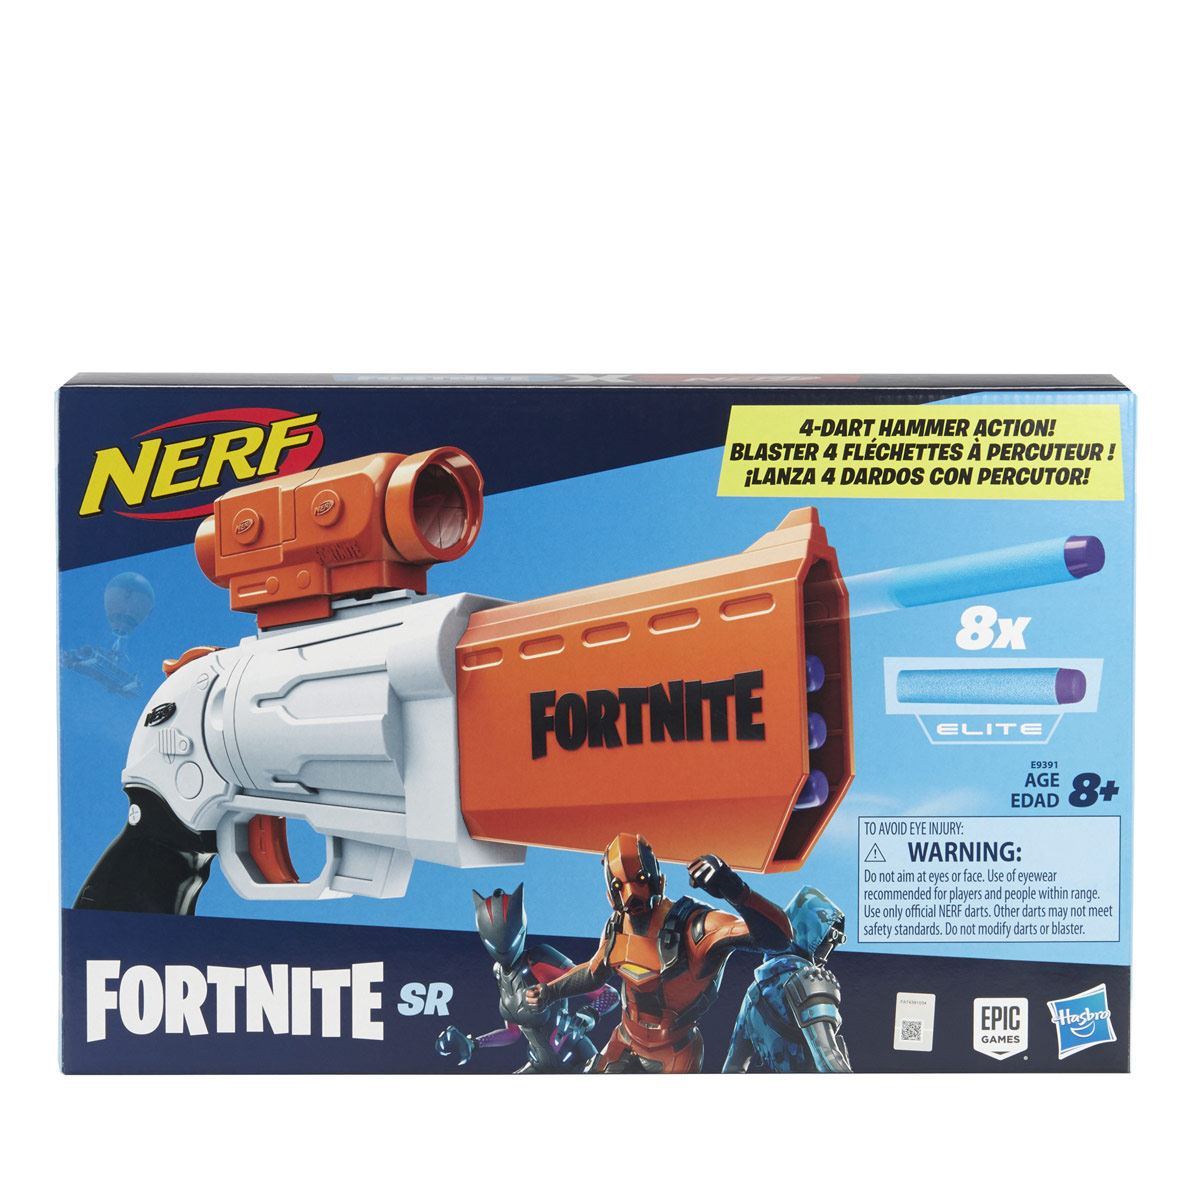 Nerf Fortnite Lanzador SR